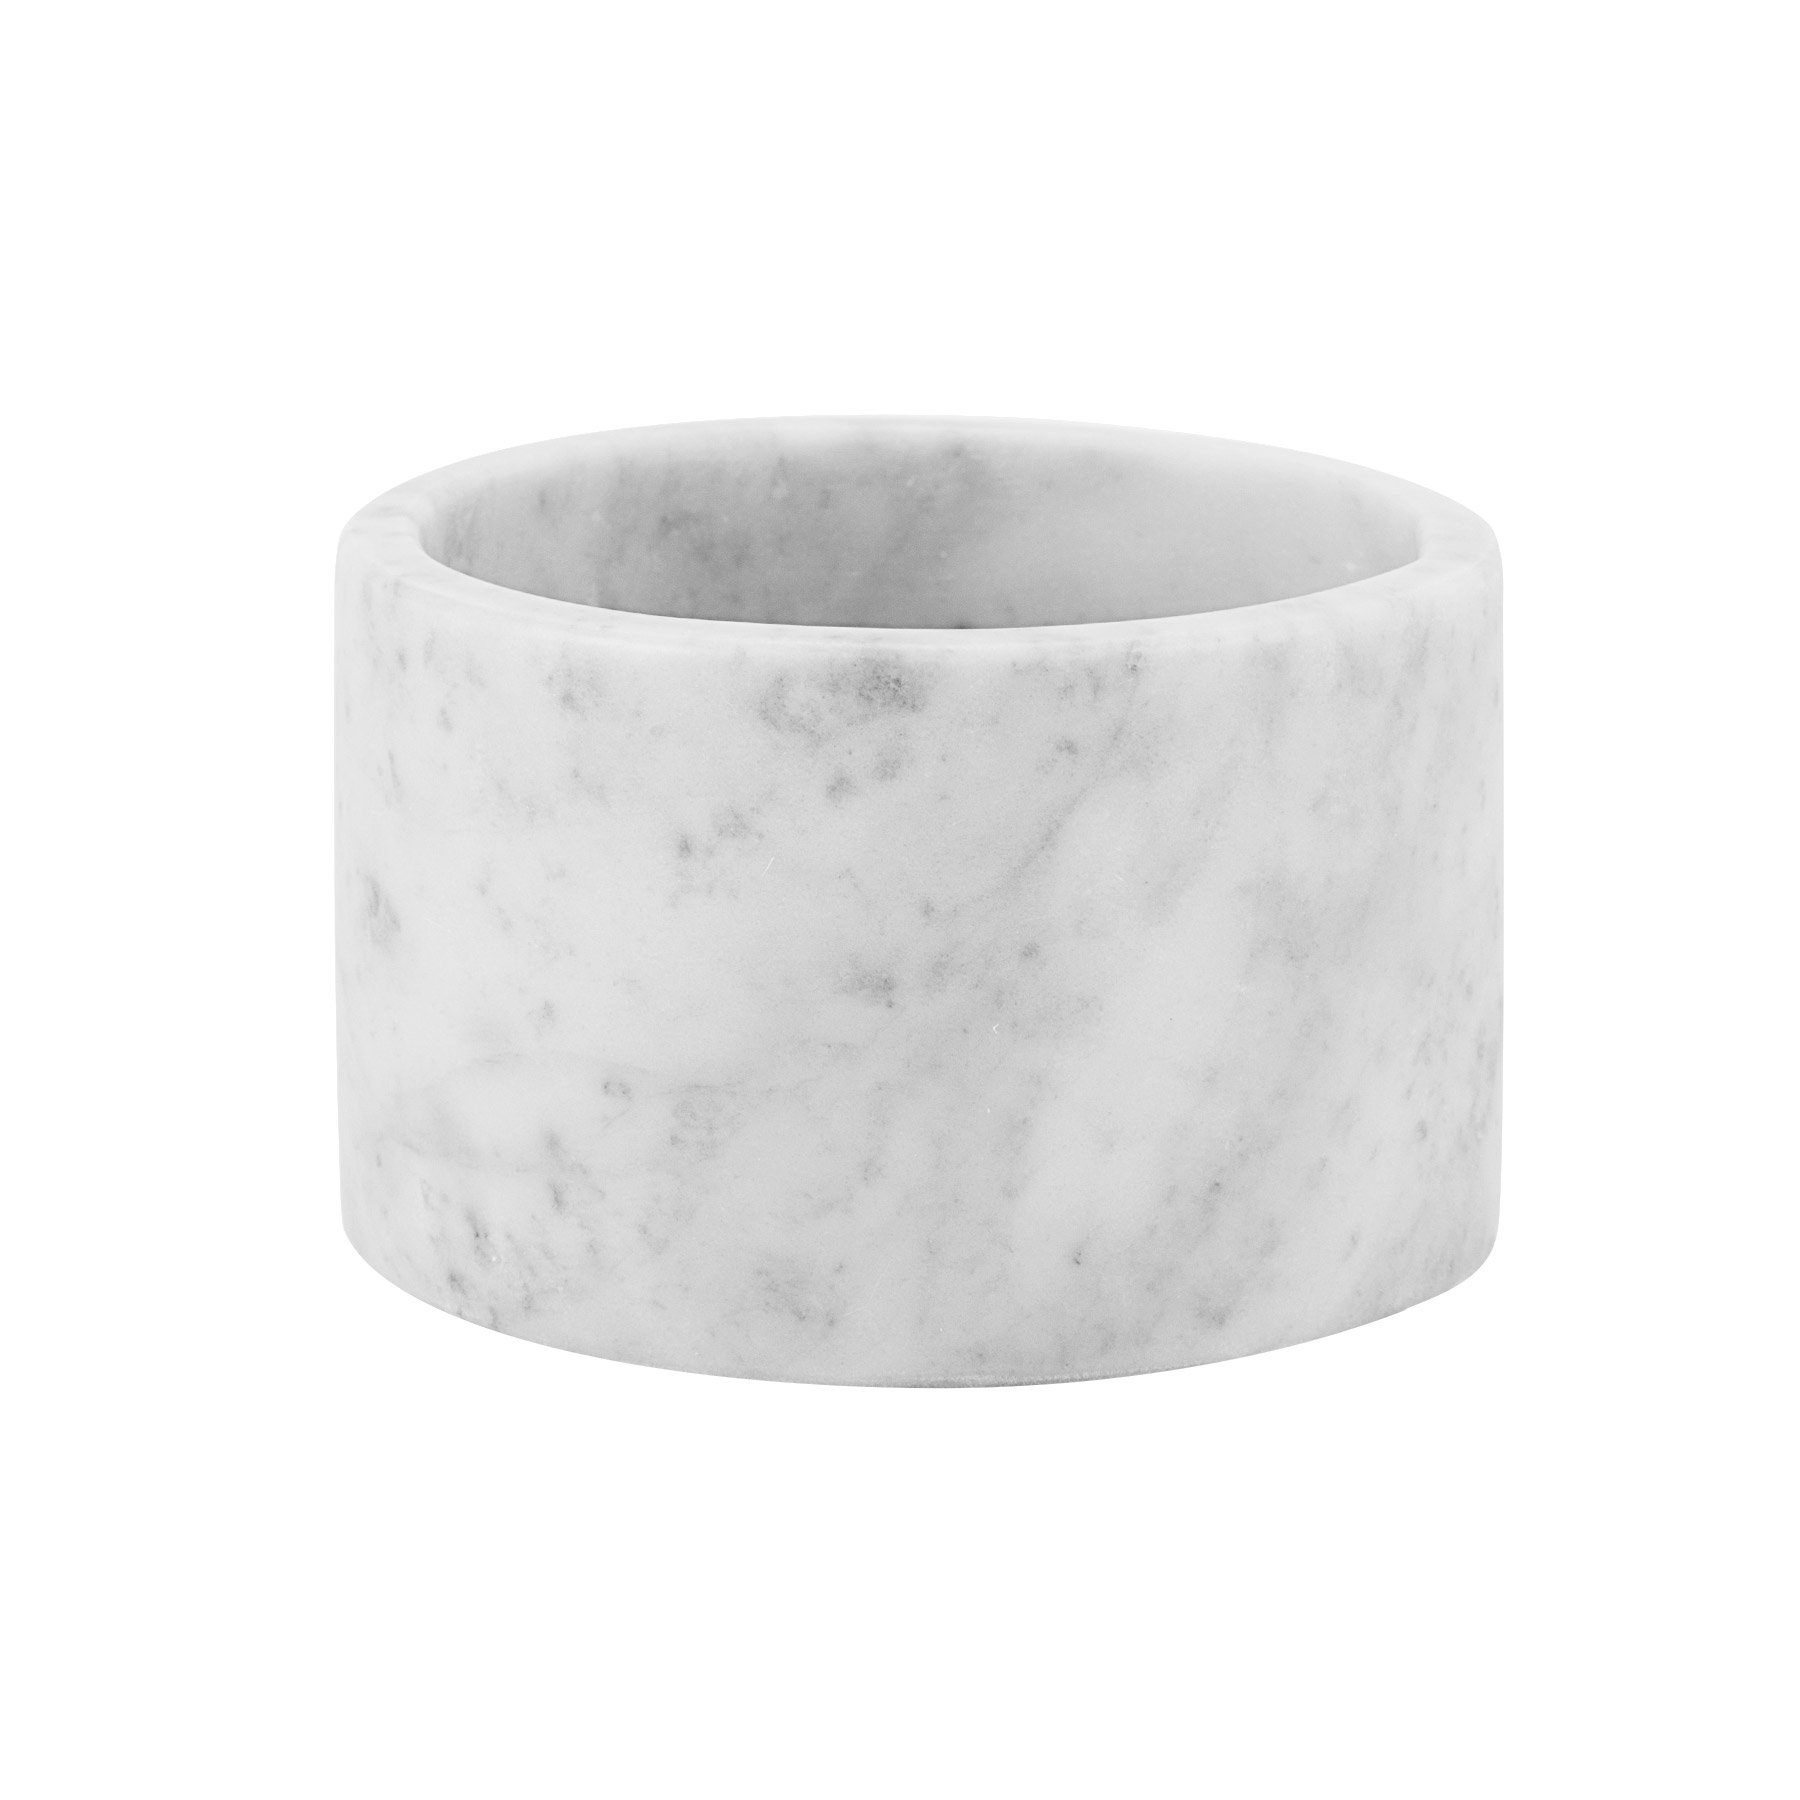 Maykke Isidora Carrara White Marble Canister Modern Bathroom, Bedroom, Office Storage Organizer Elegant Decorative Holder for Makeup Brushes, Accessories White, NHA1270101